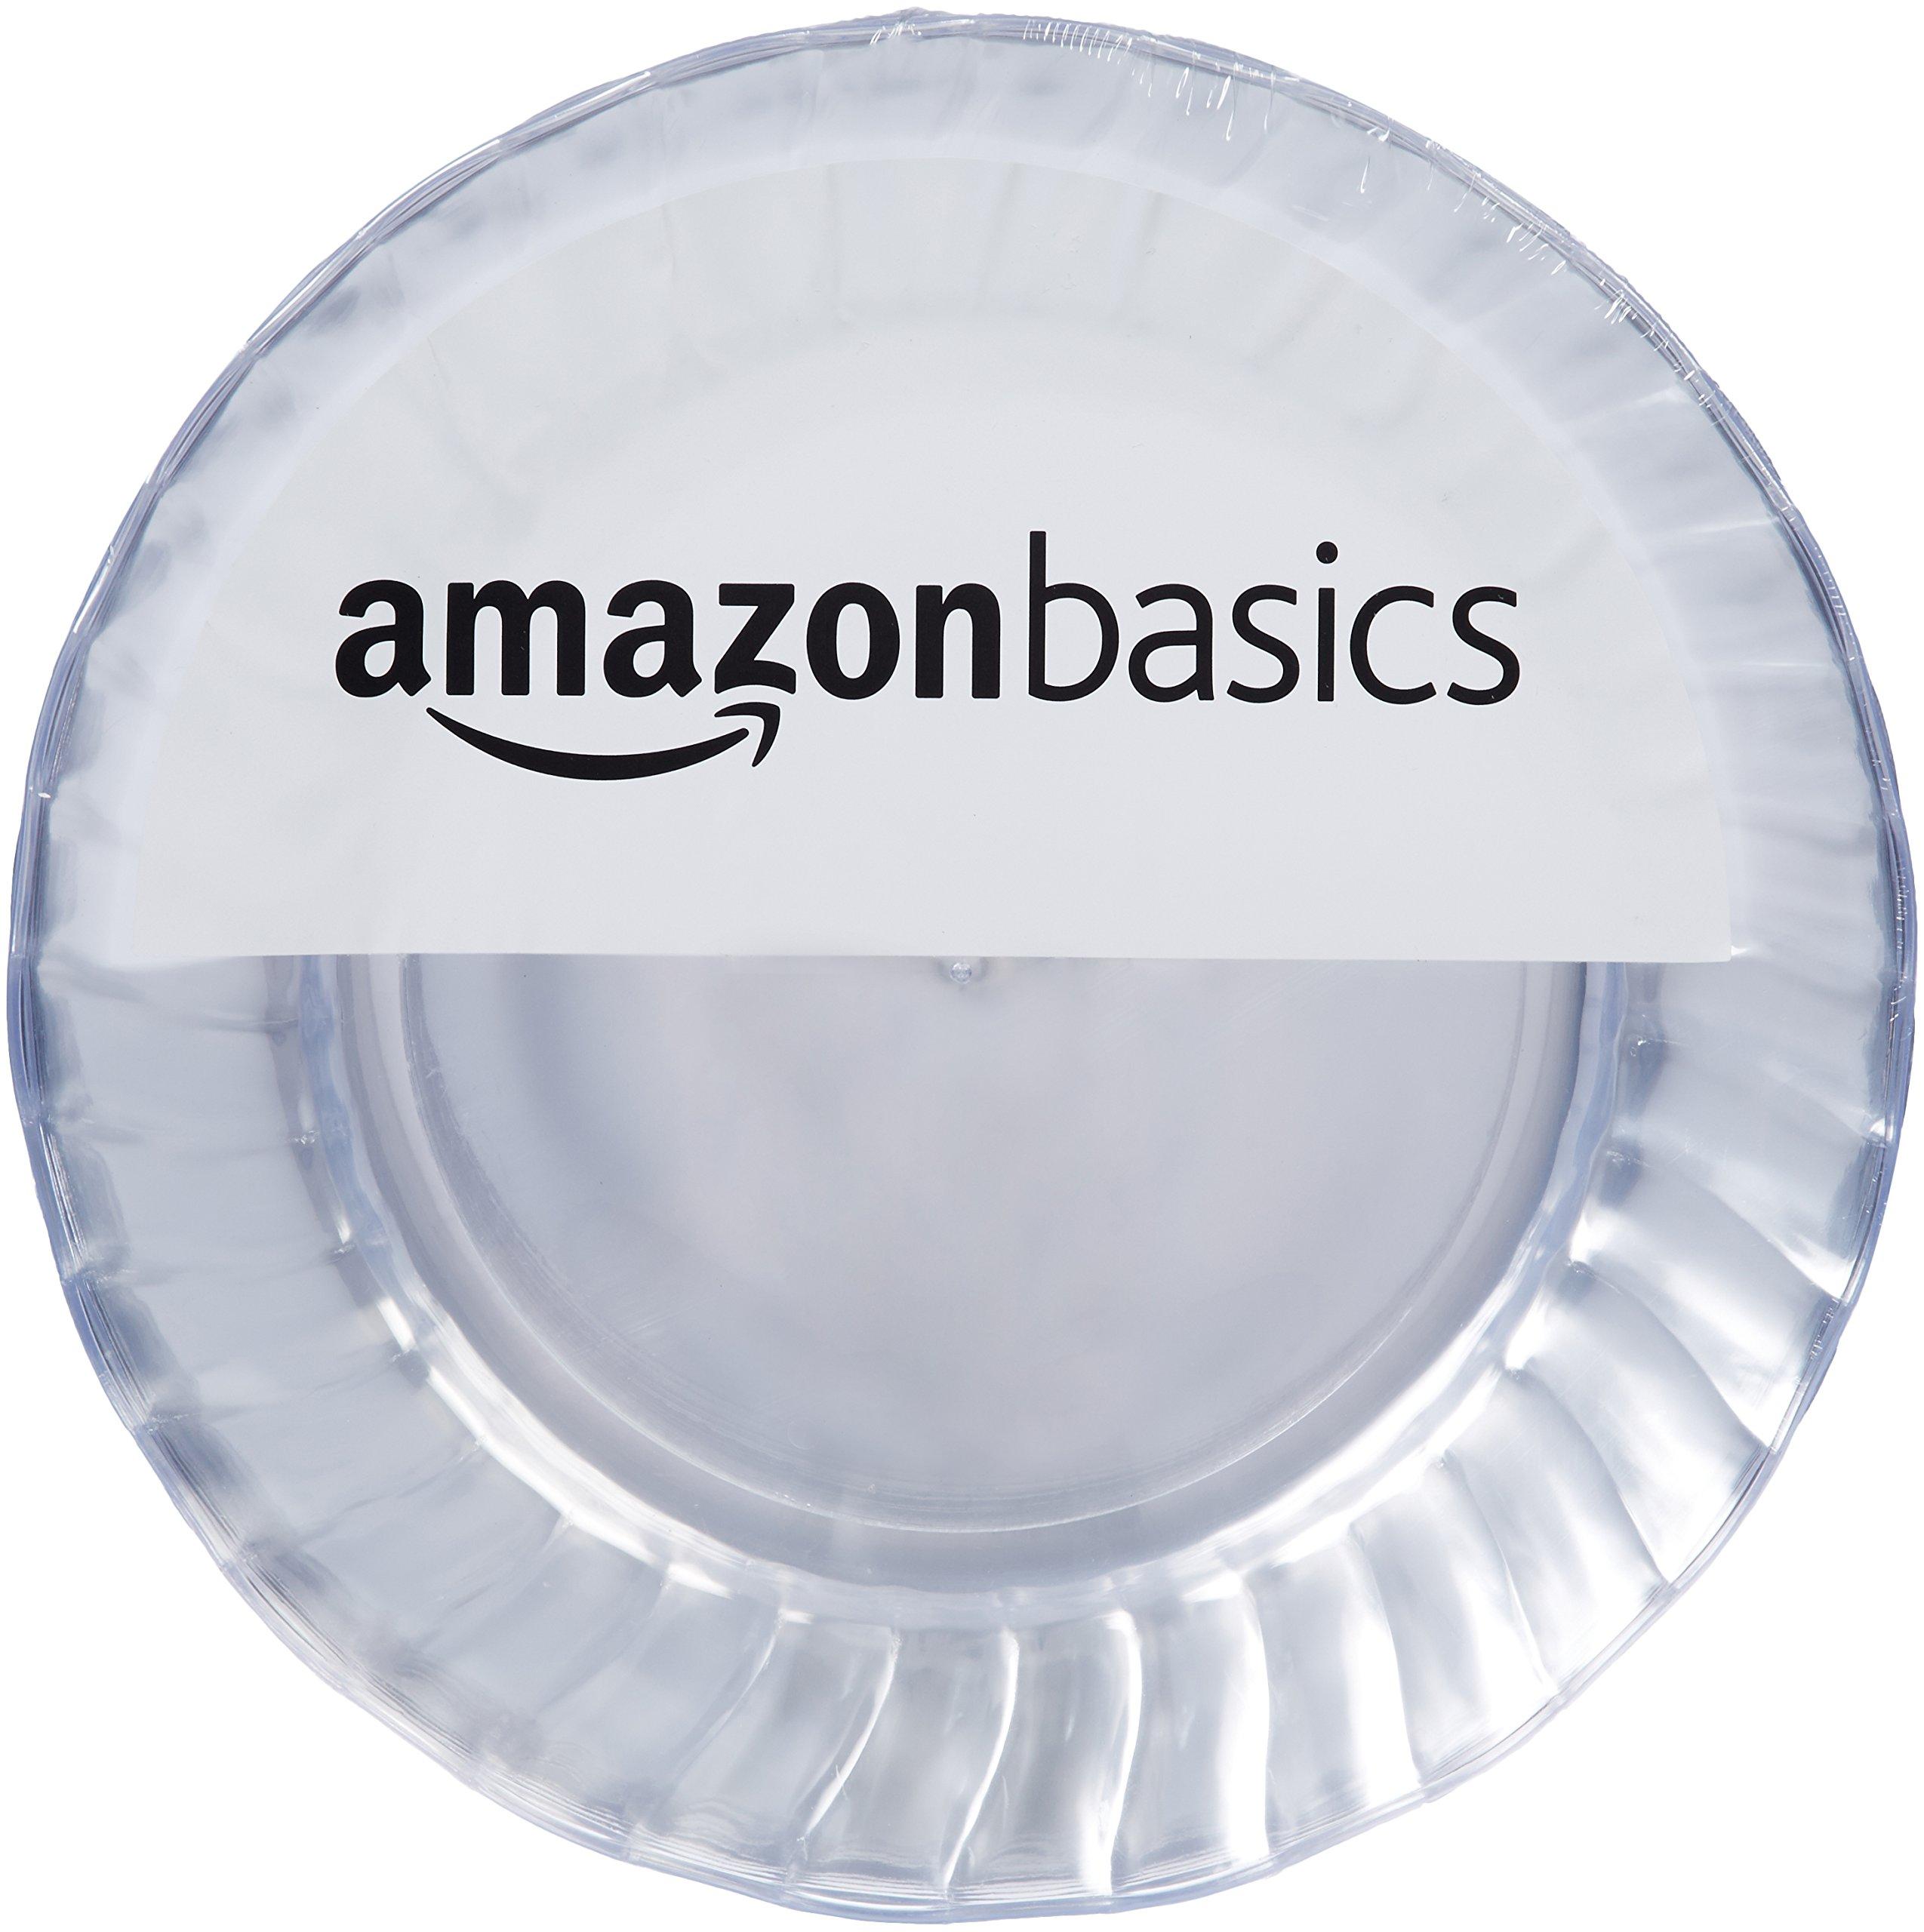 AmazonBasics Disposable Plastic Plates - 100-Pack, 7.5-inch by AmazonBasics (Image #1)